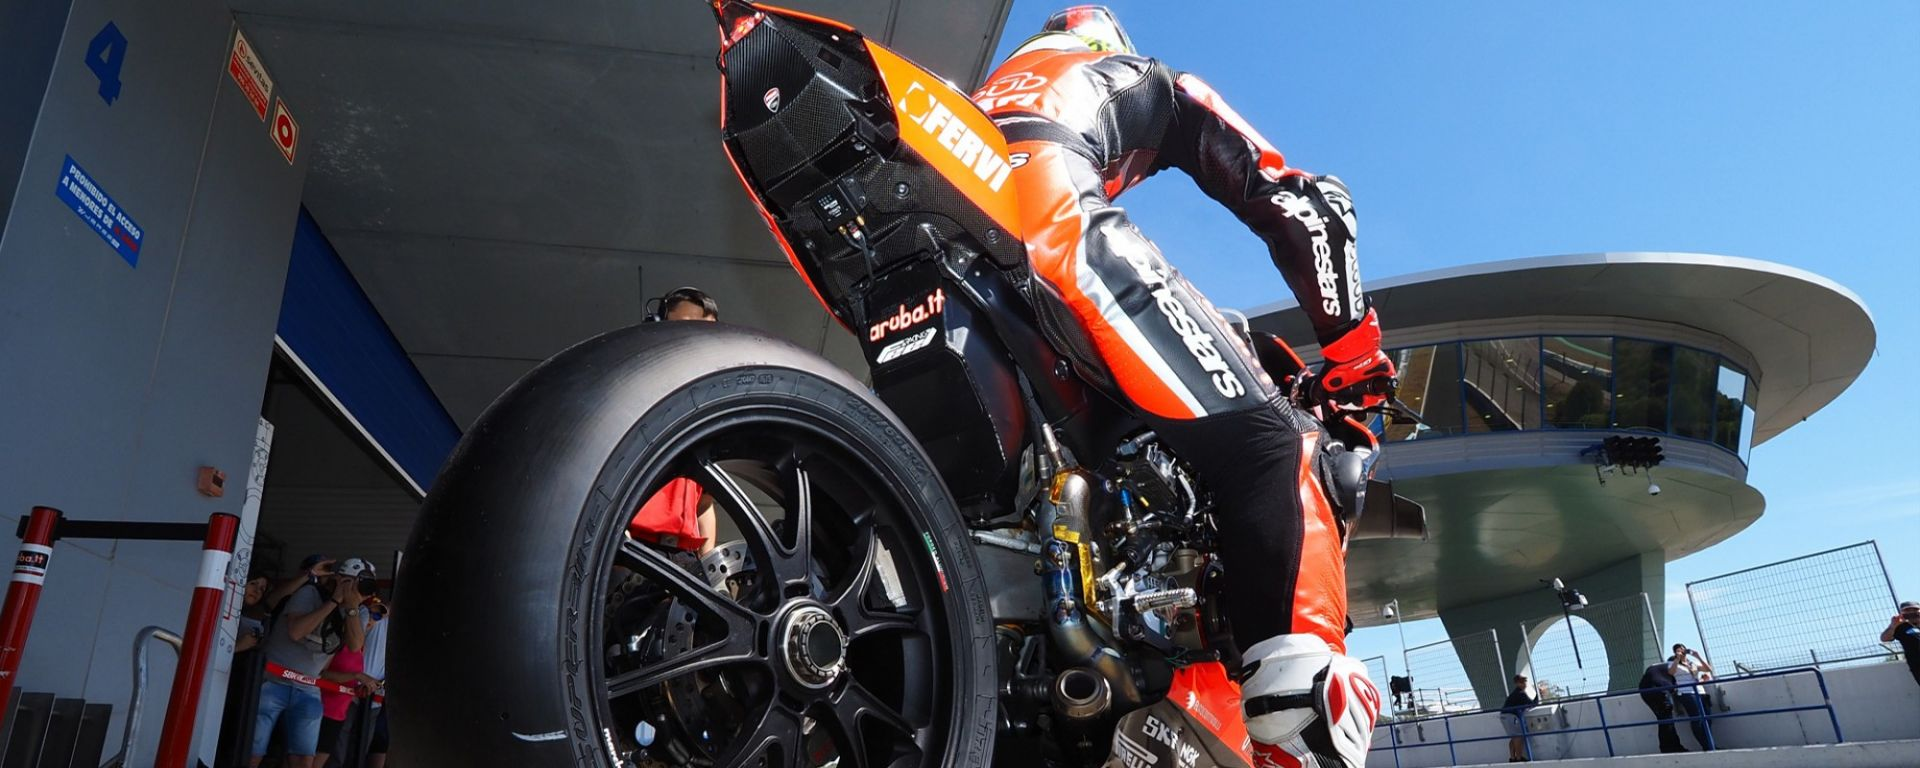 Superbike, Ducati, Jerez